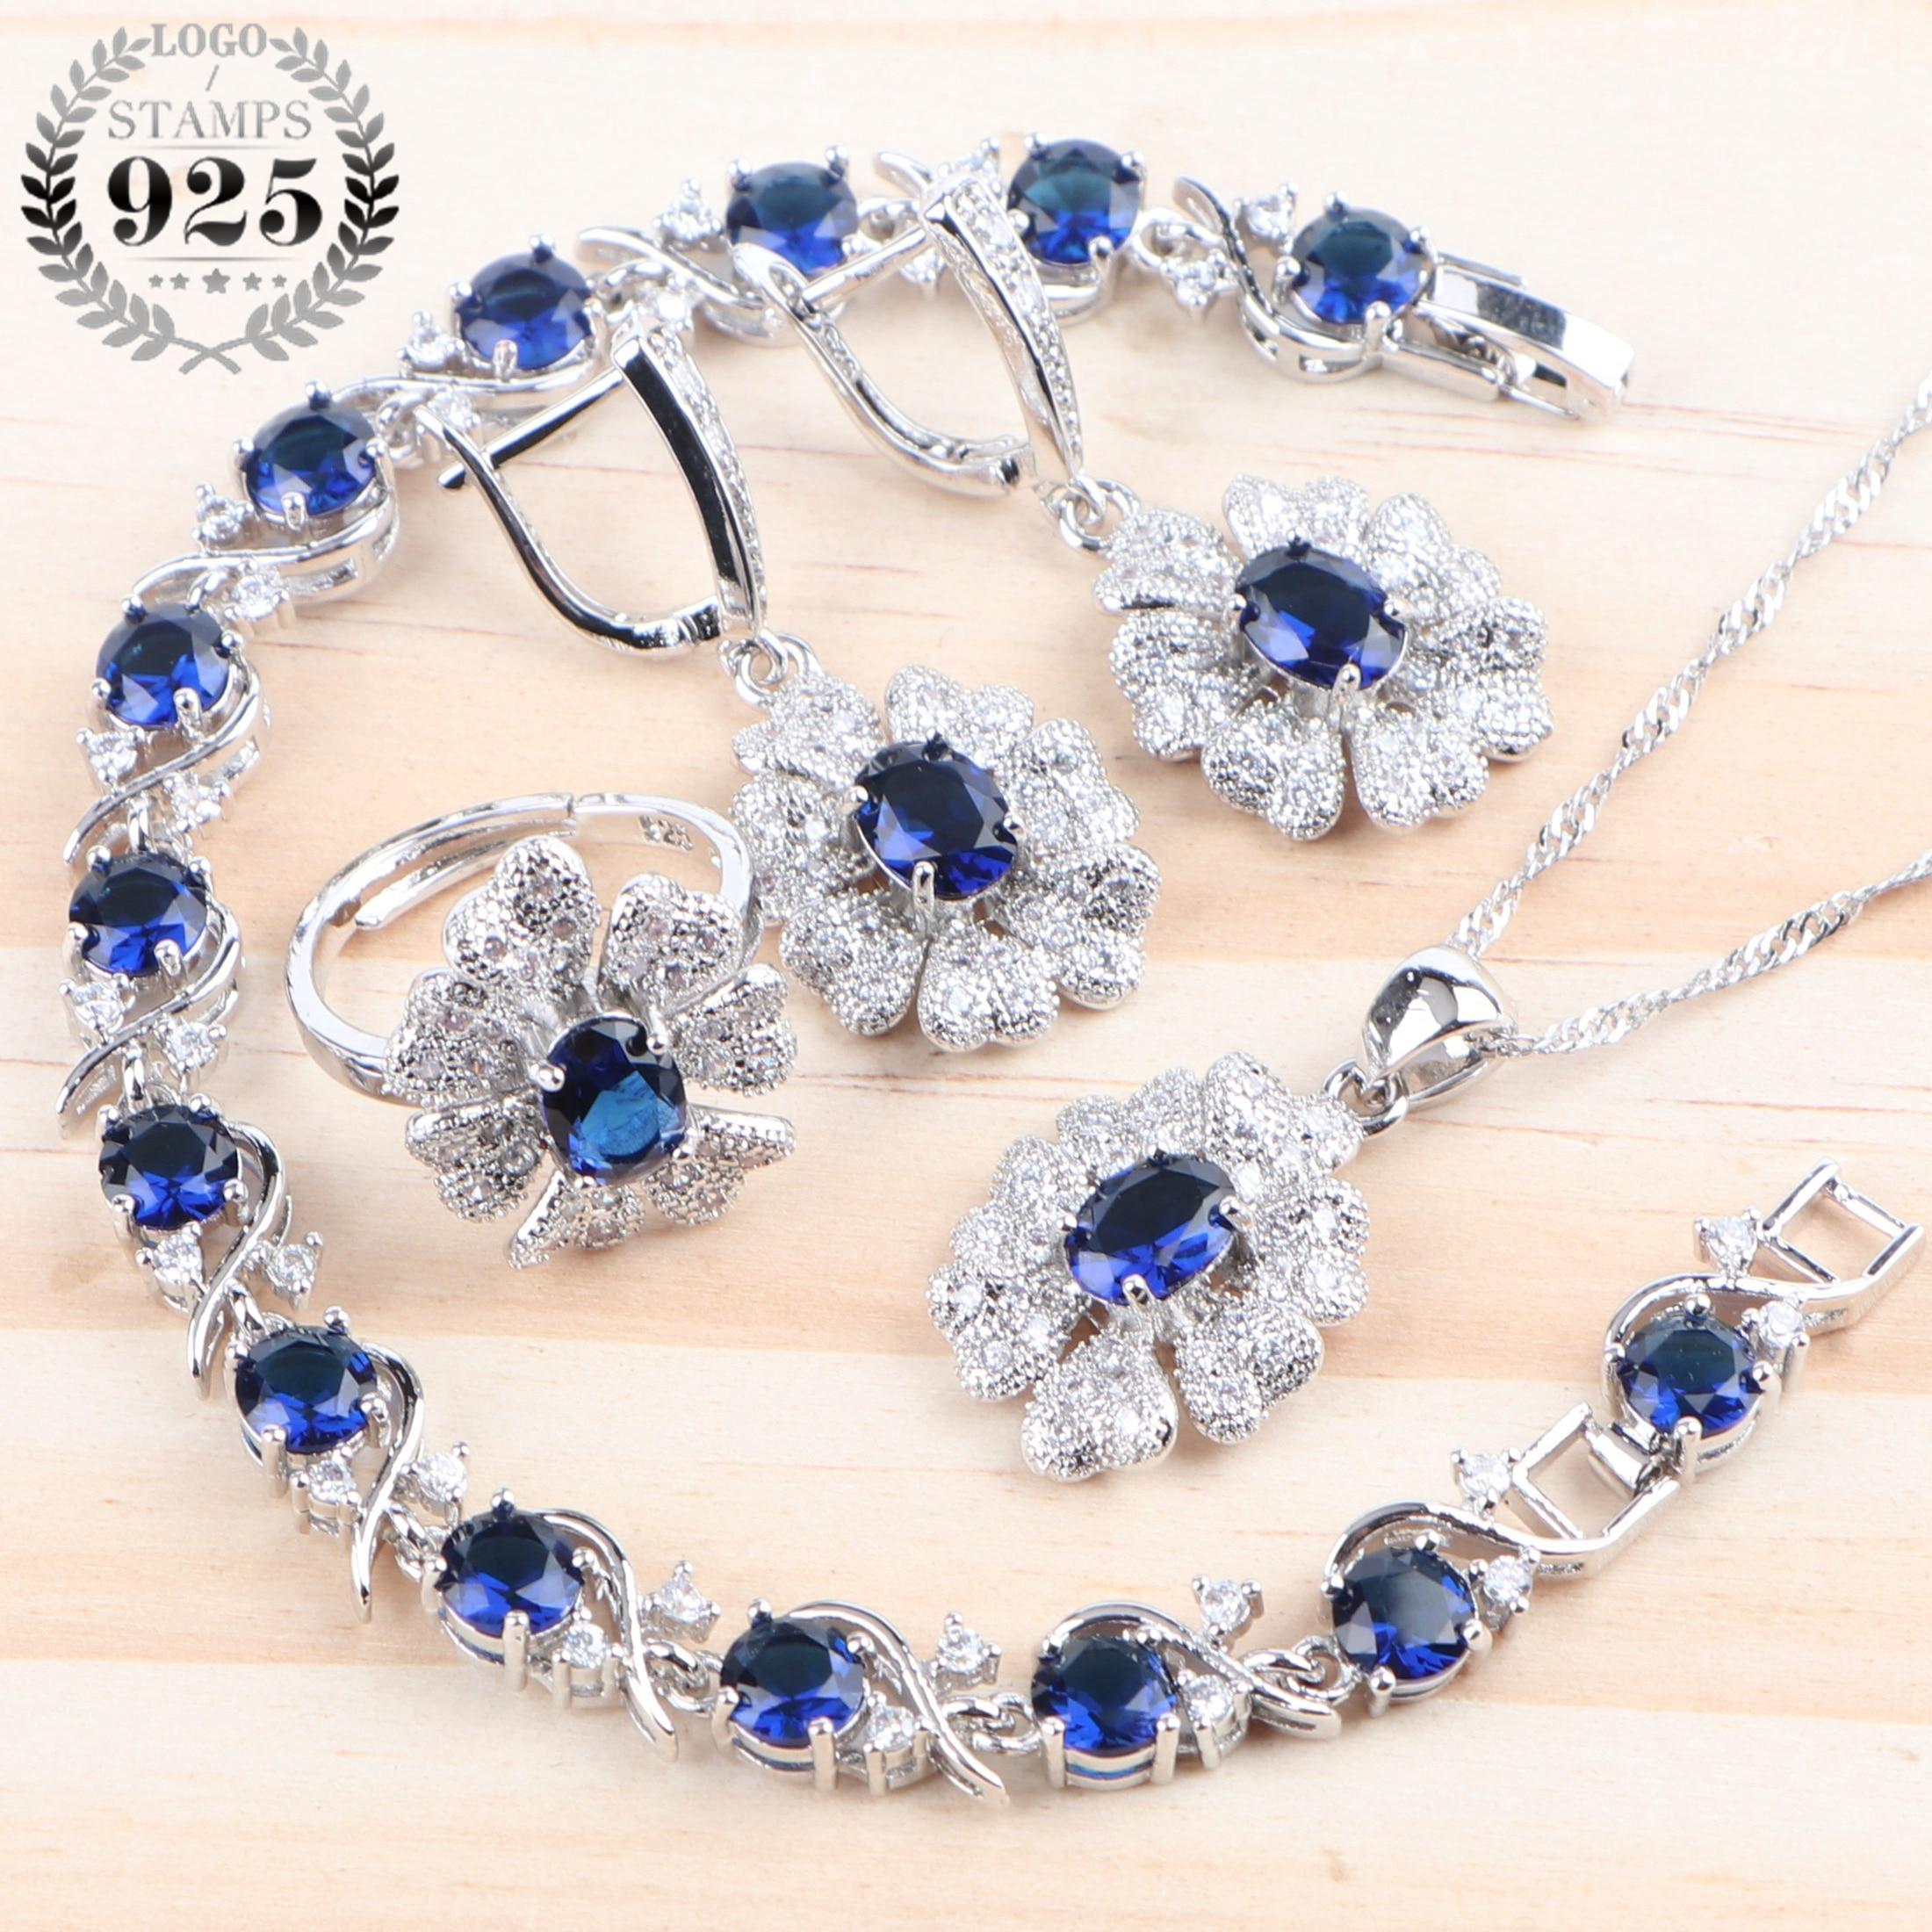 Wedding Silver 925 Bridal Jewelry Sets Women Costume Blue Cubic Zirconia Jewelry Ring Bracelet Earrings Pendant Necklace Sets